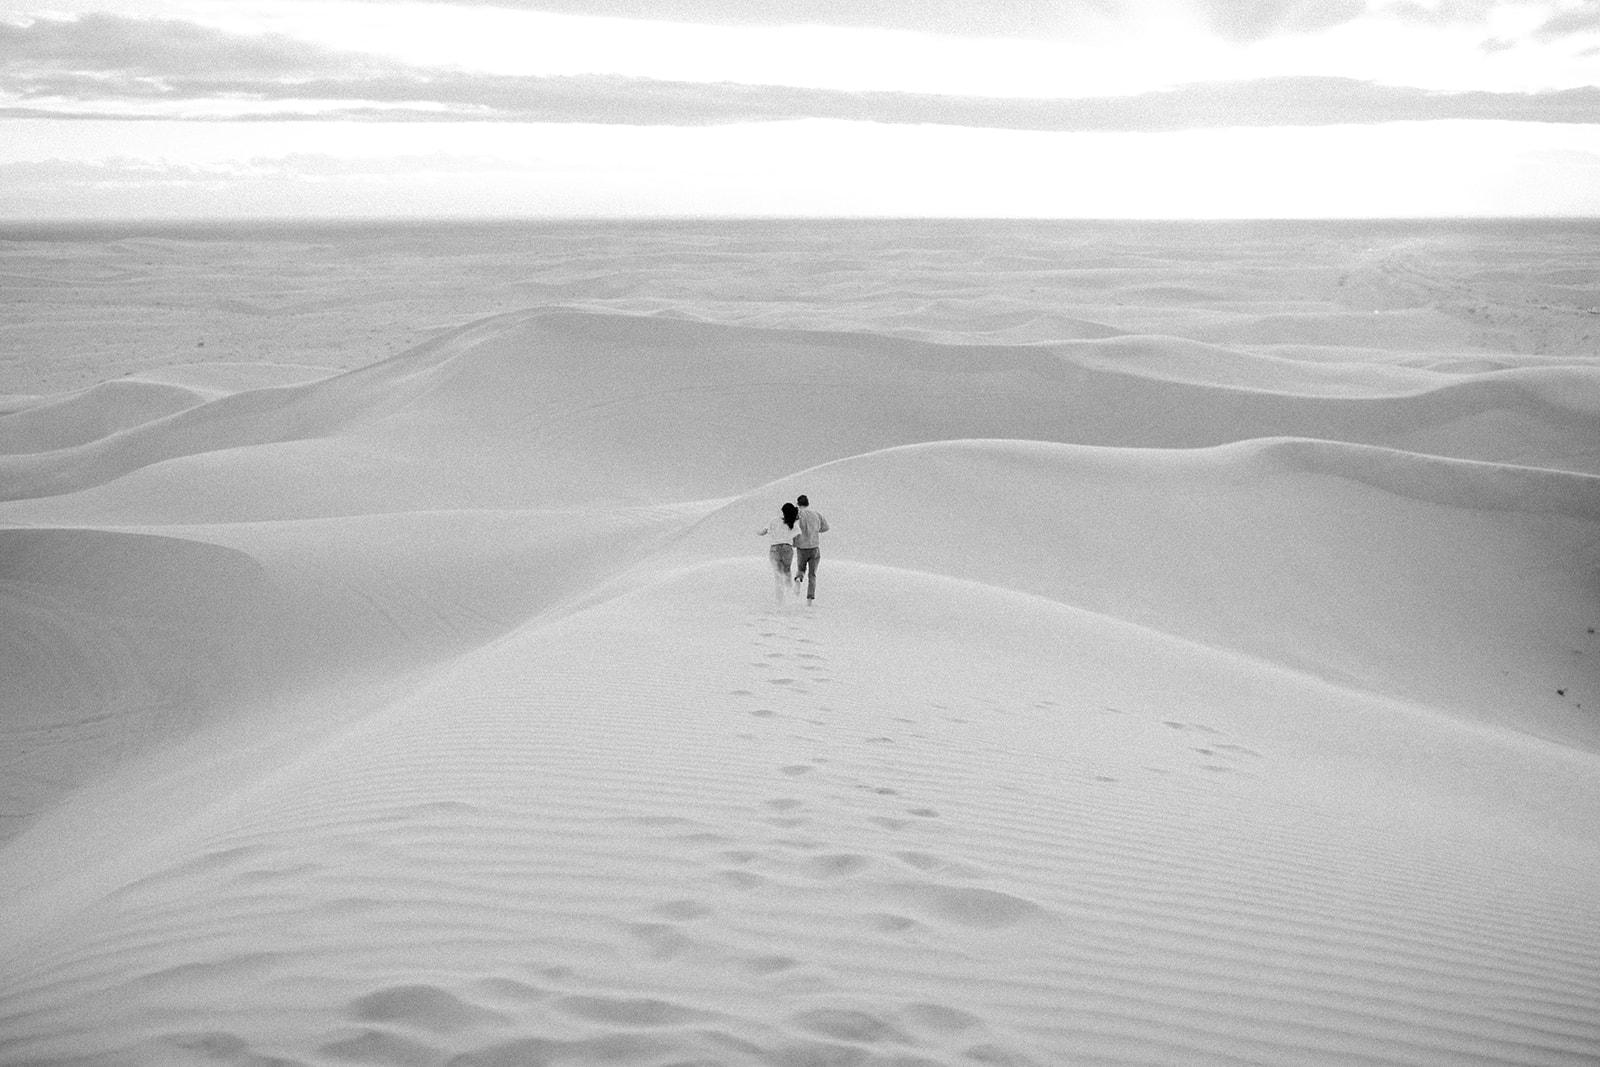 Imperial_Sand_Dunes_Linda_and_Sam_Dawn_Charles_Photographer-134.jpg